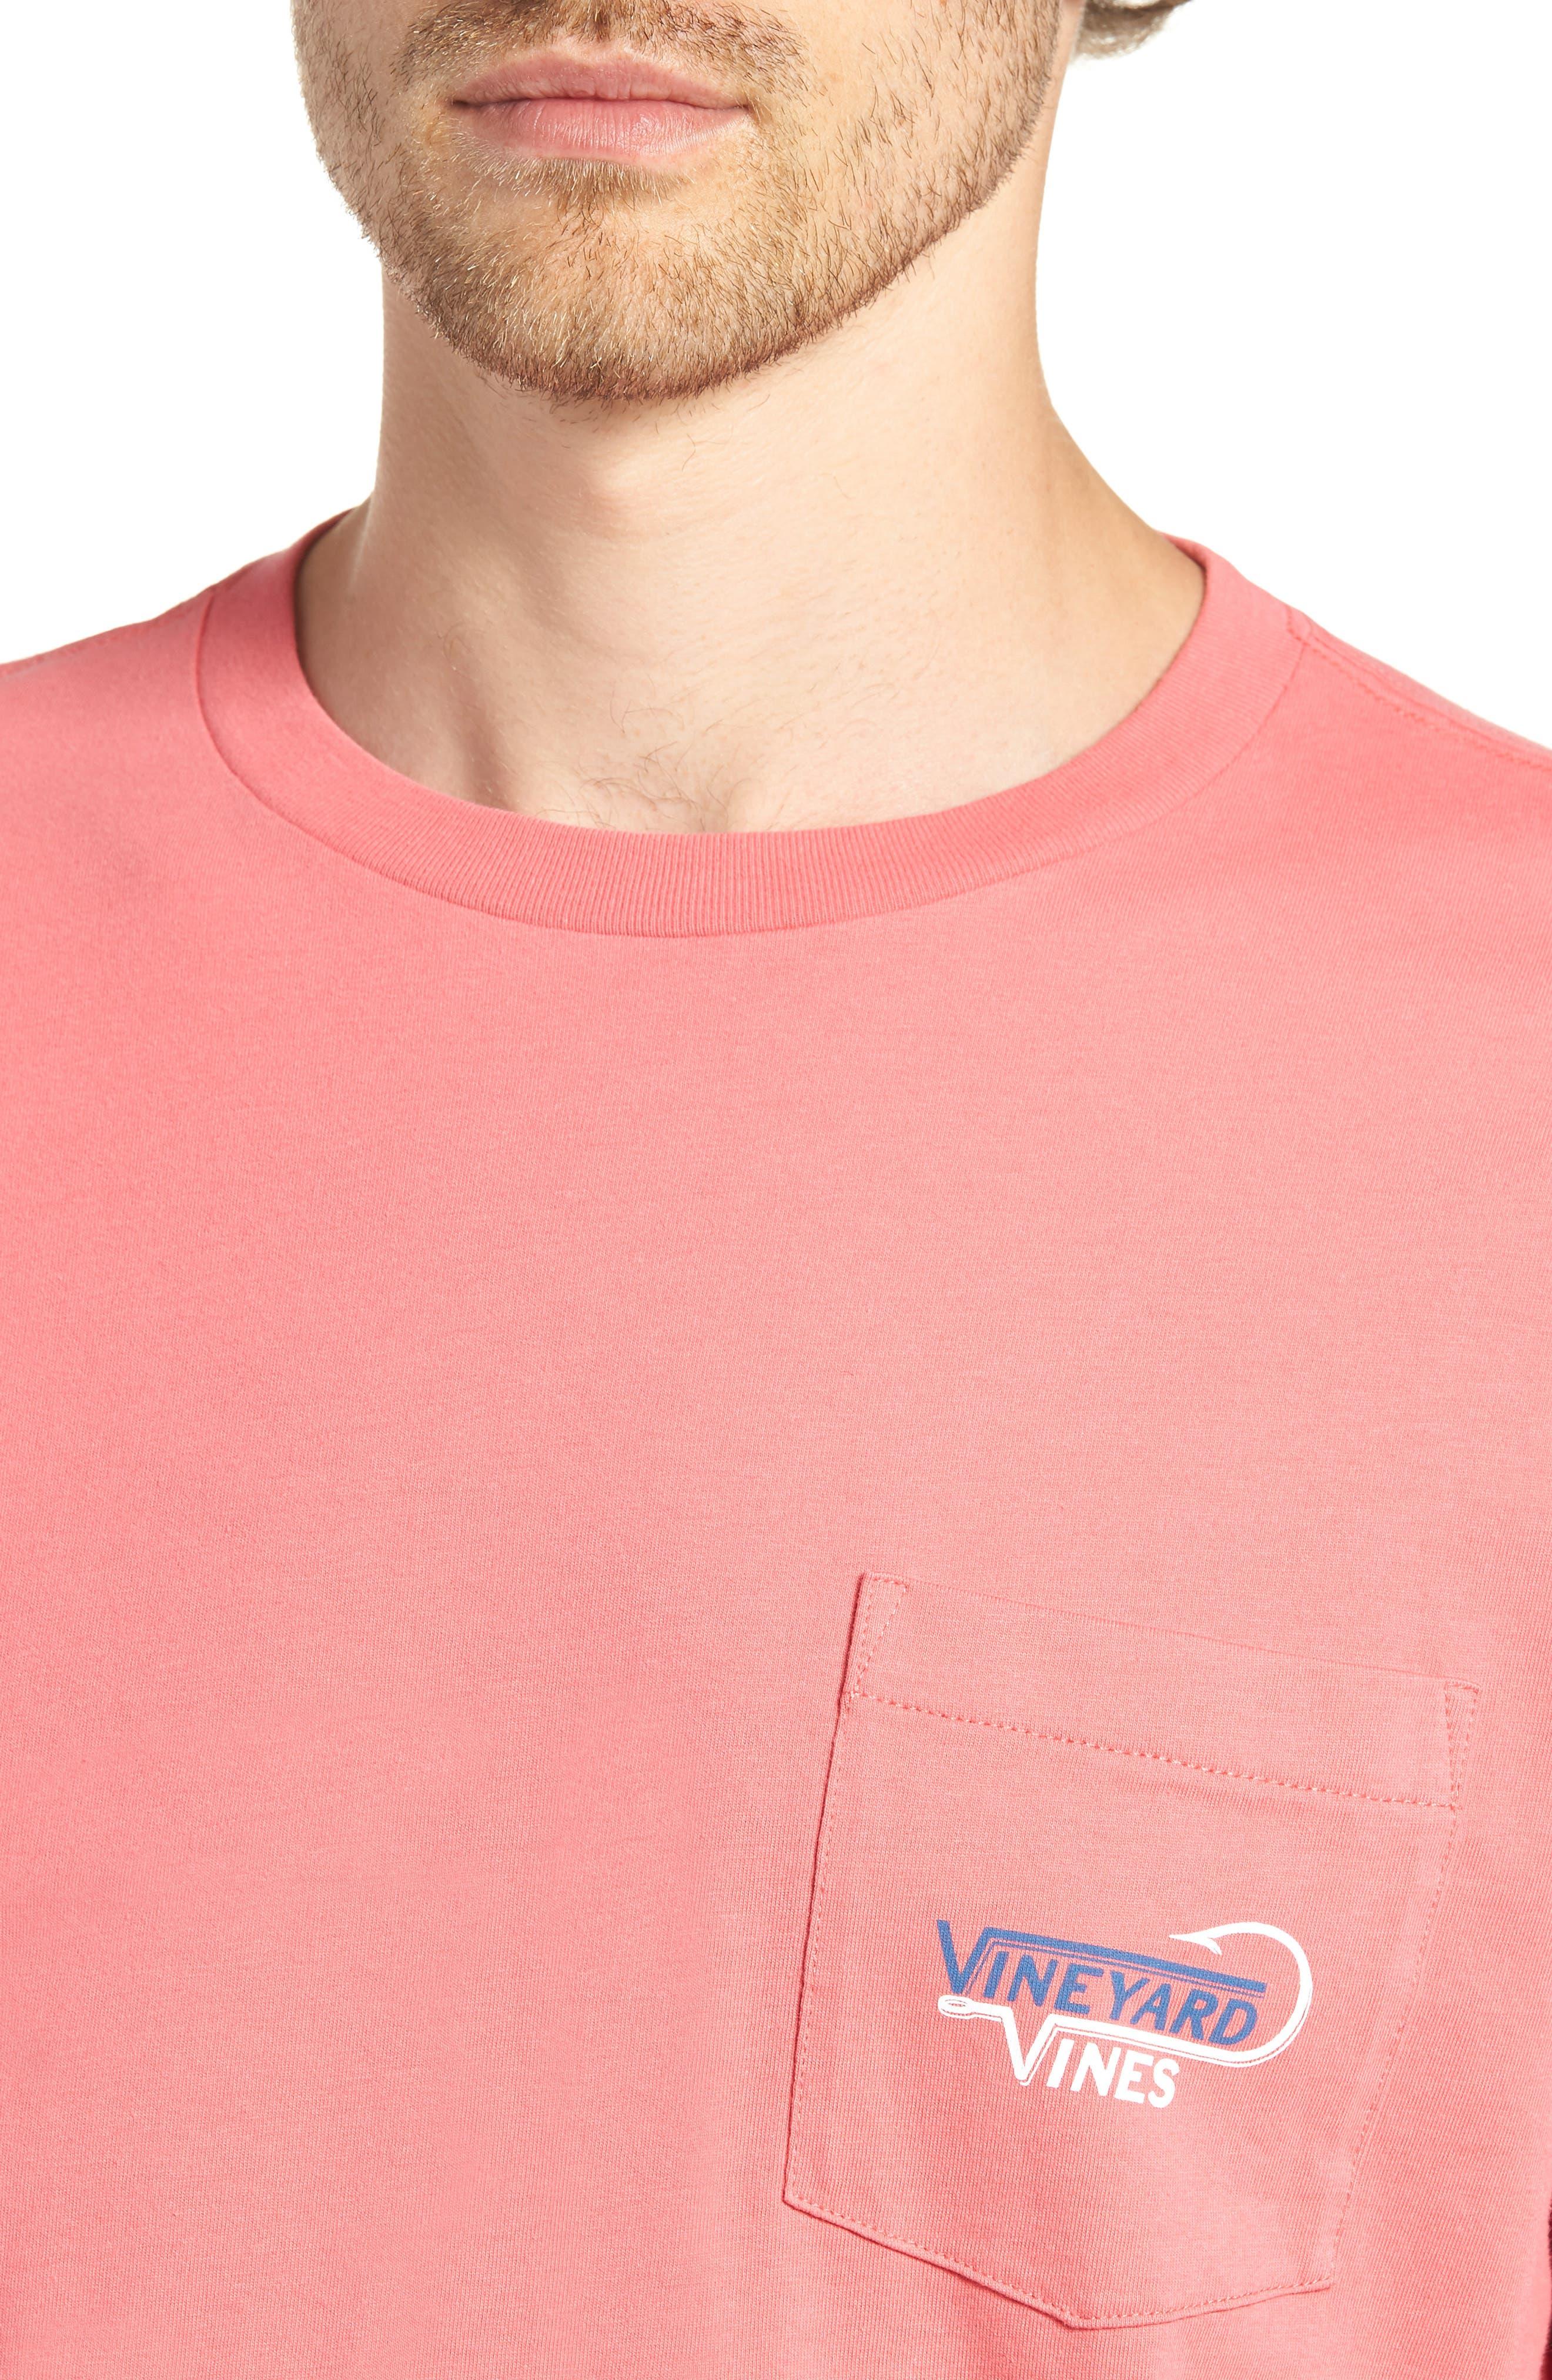 Vineyard Hook Regular Fit Crewneck T-Shirt,                             Alternate thumbnail 4, color,                             Jetty Red